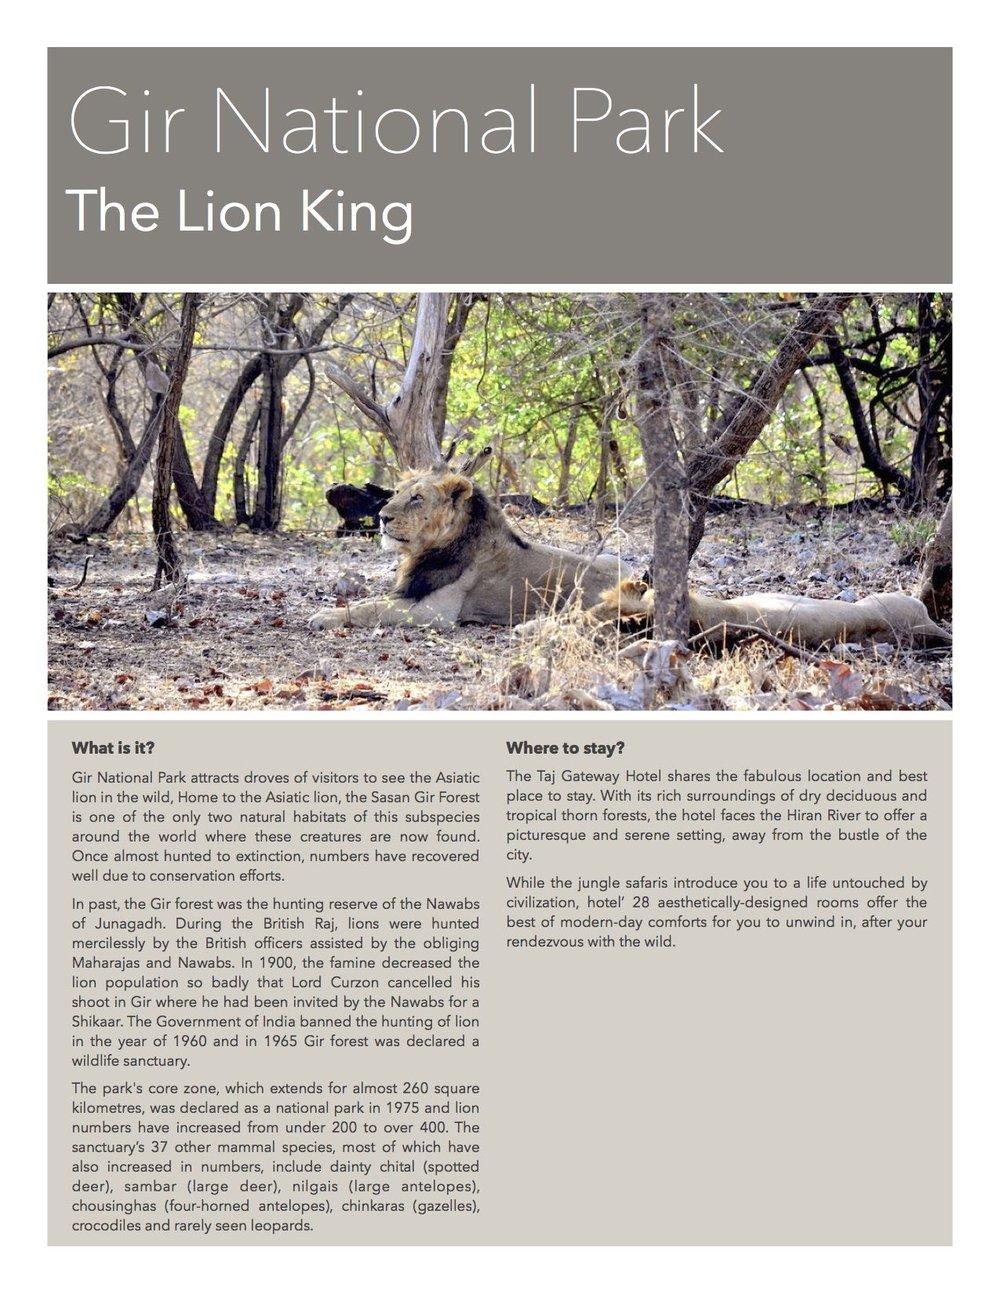 Gir National Park - Wildlife Sanctuary in Gujarat